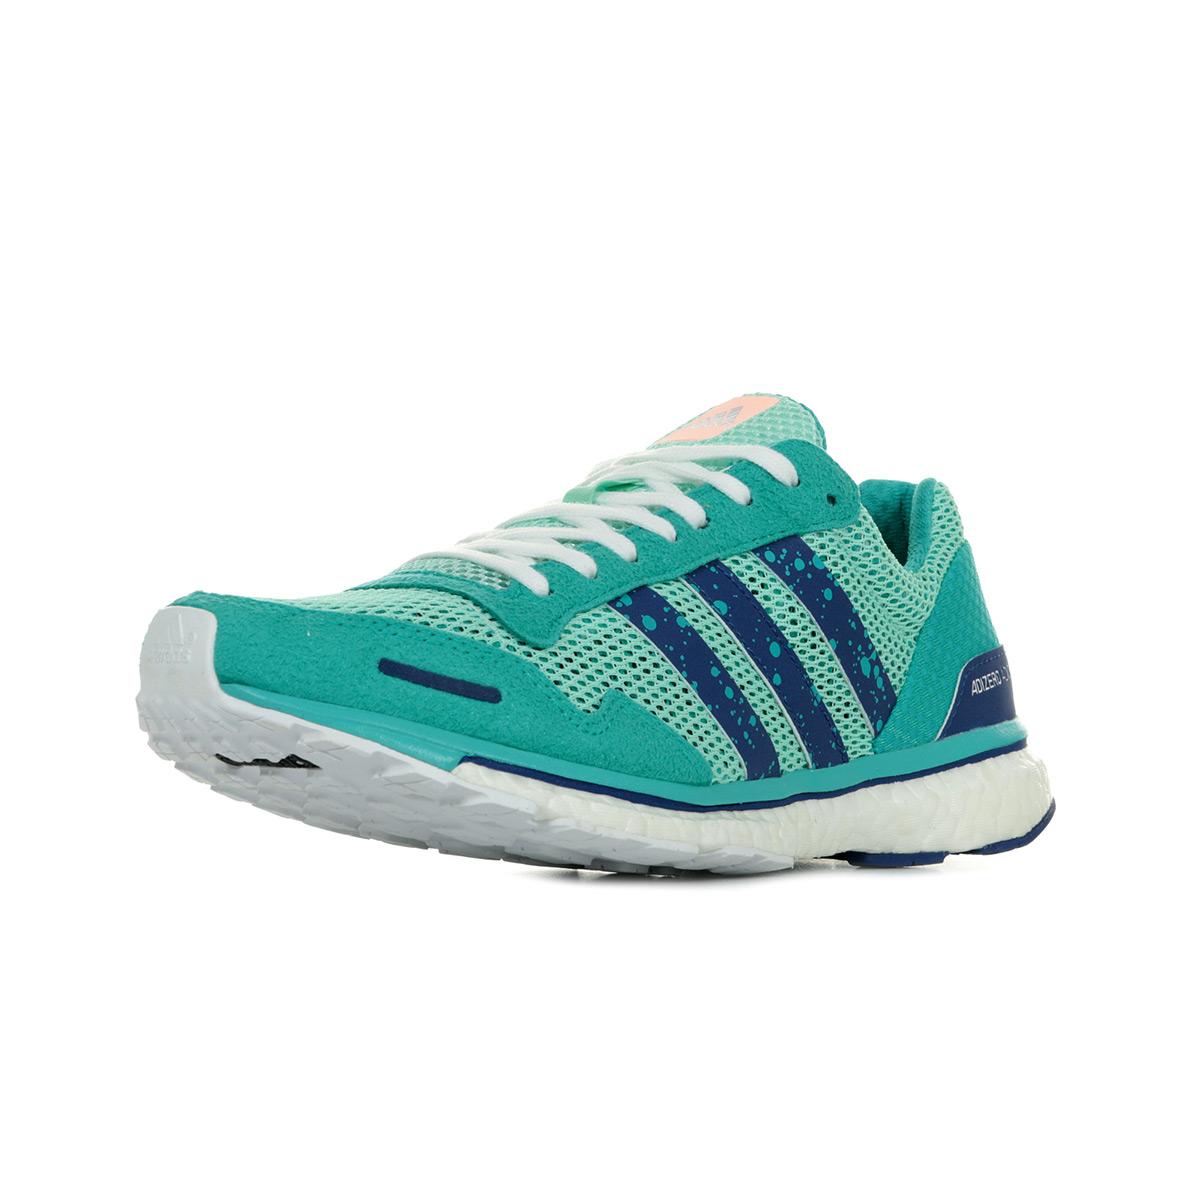 Détails sur Chaussures adidas Performance femme Adizero Adios 3 Wn's Running taille Vert